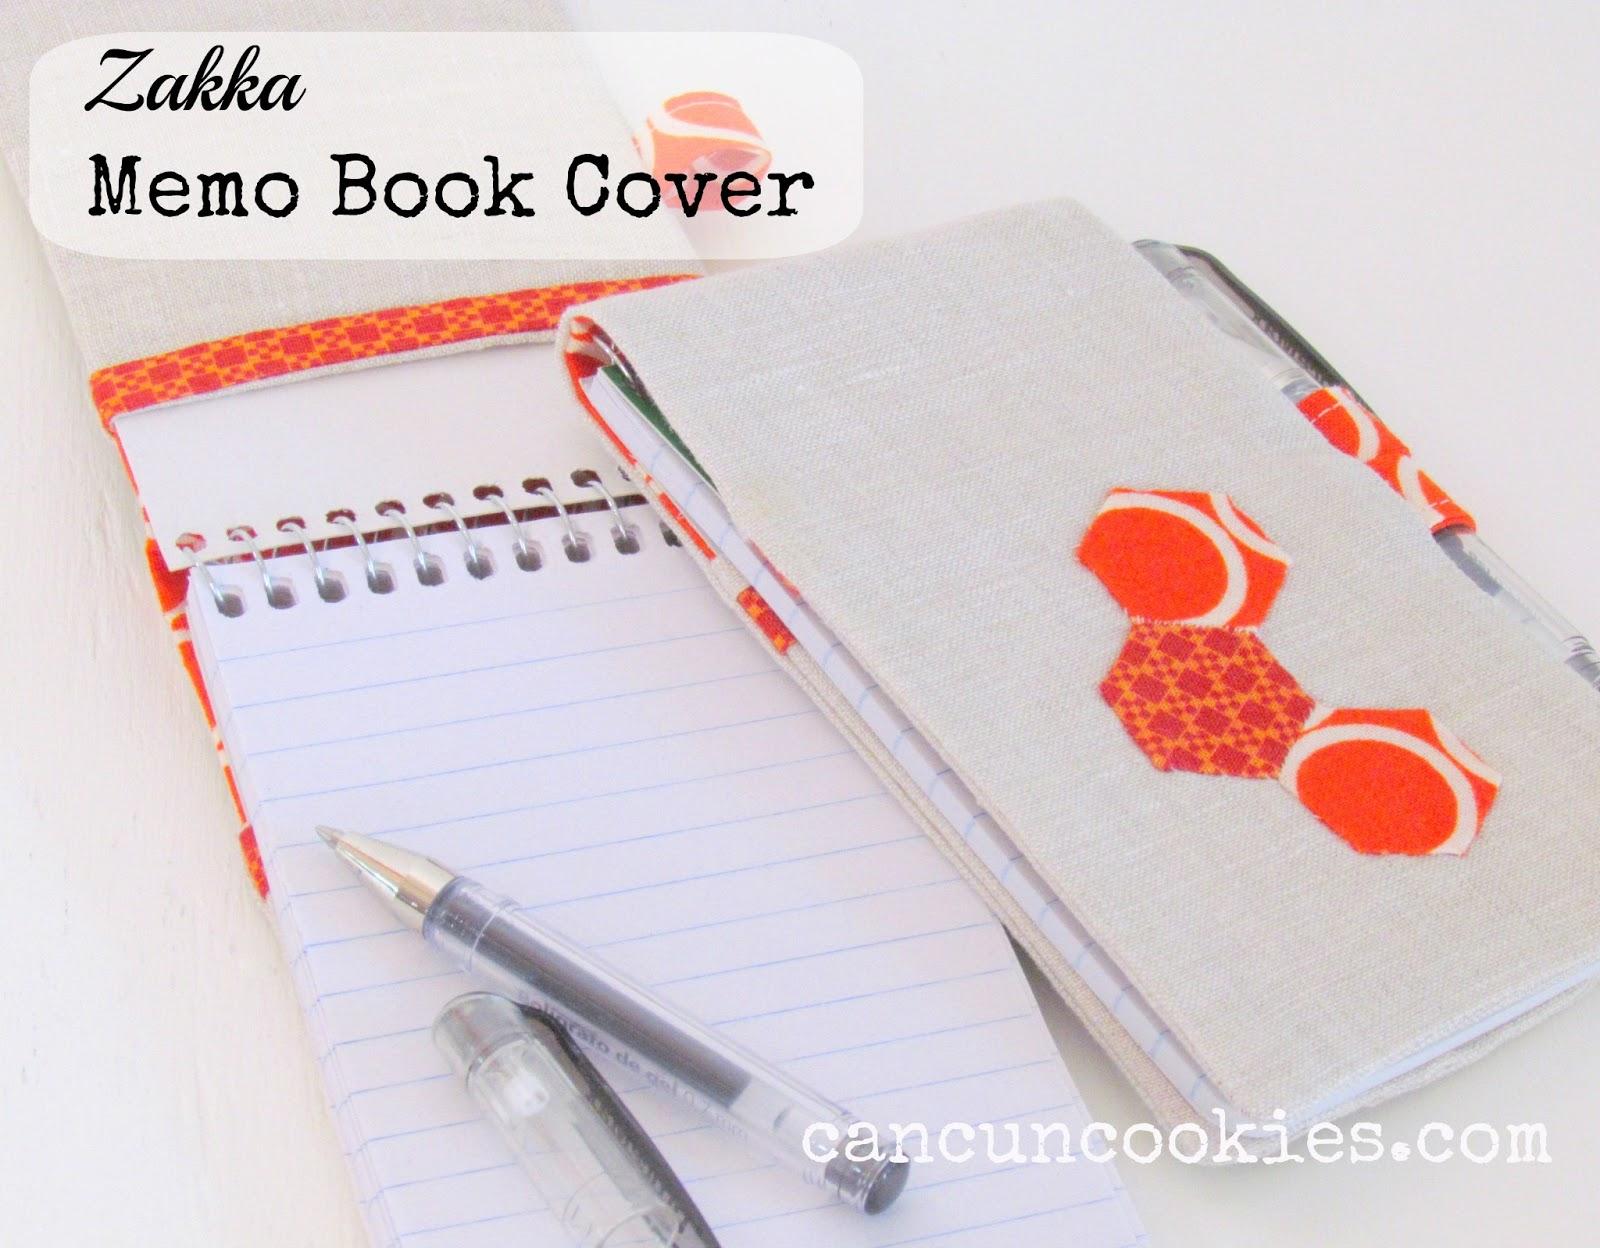 Book Cover Tutorial : Cancuncookies zakka memo book cover tutorial